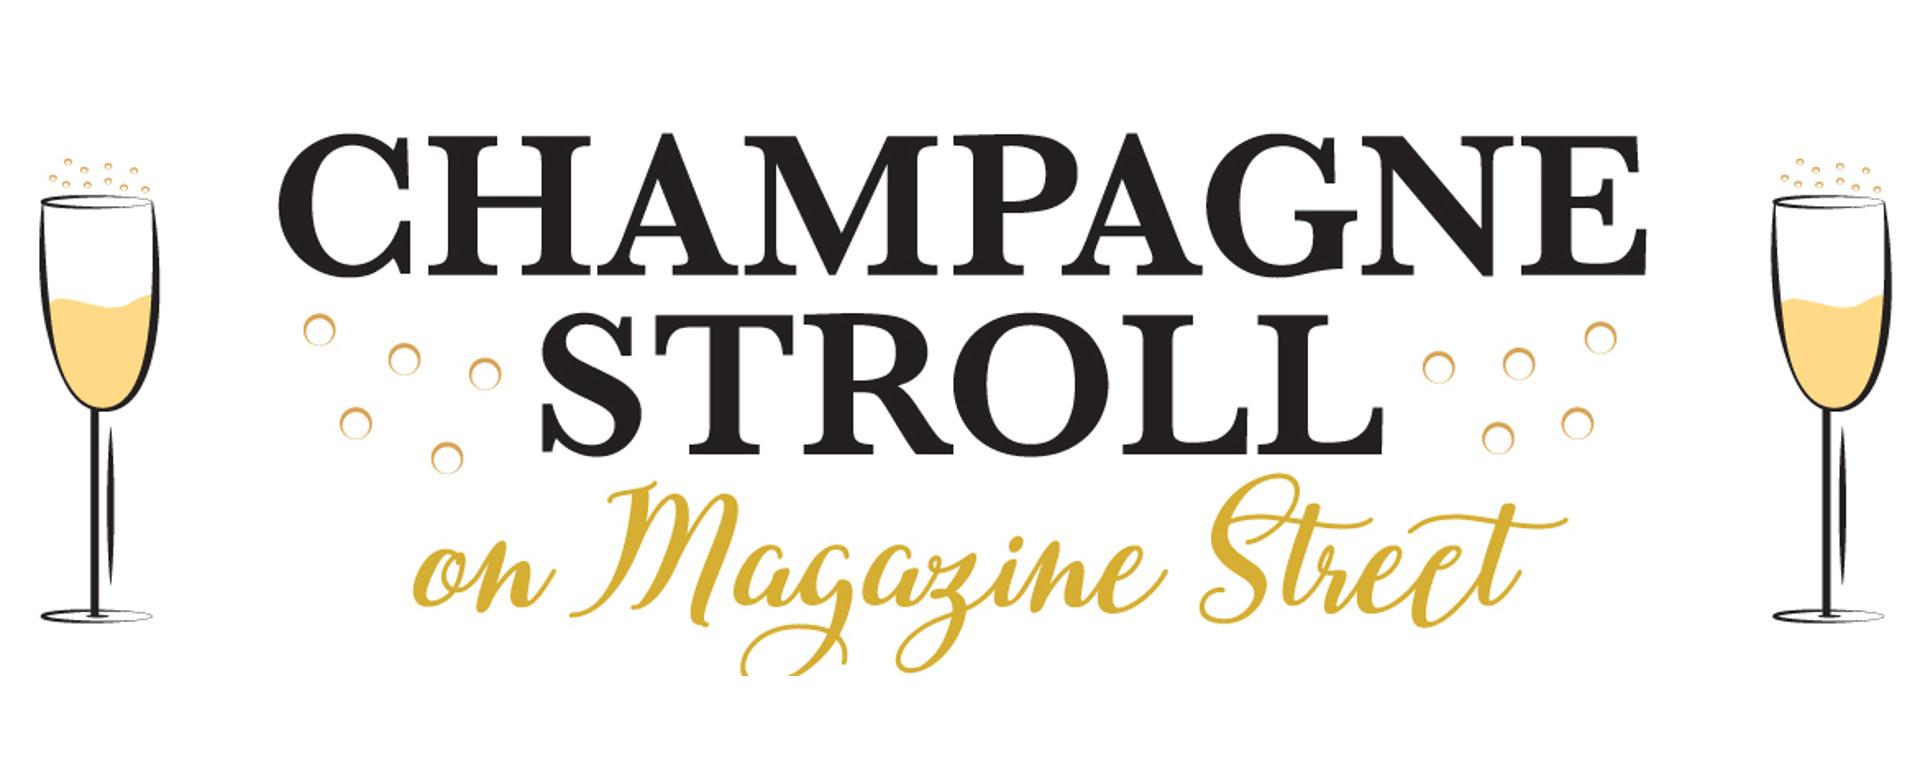 Champagne Stroll